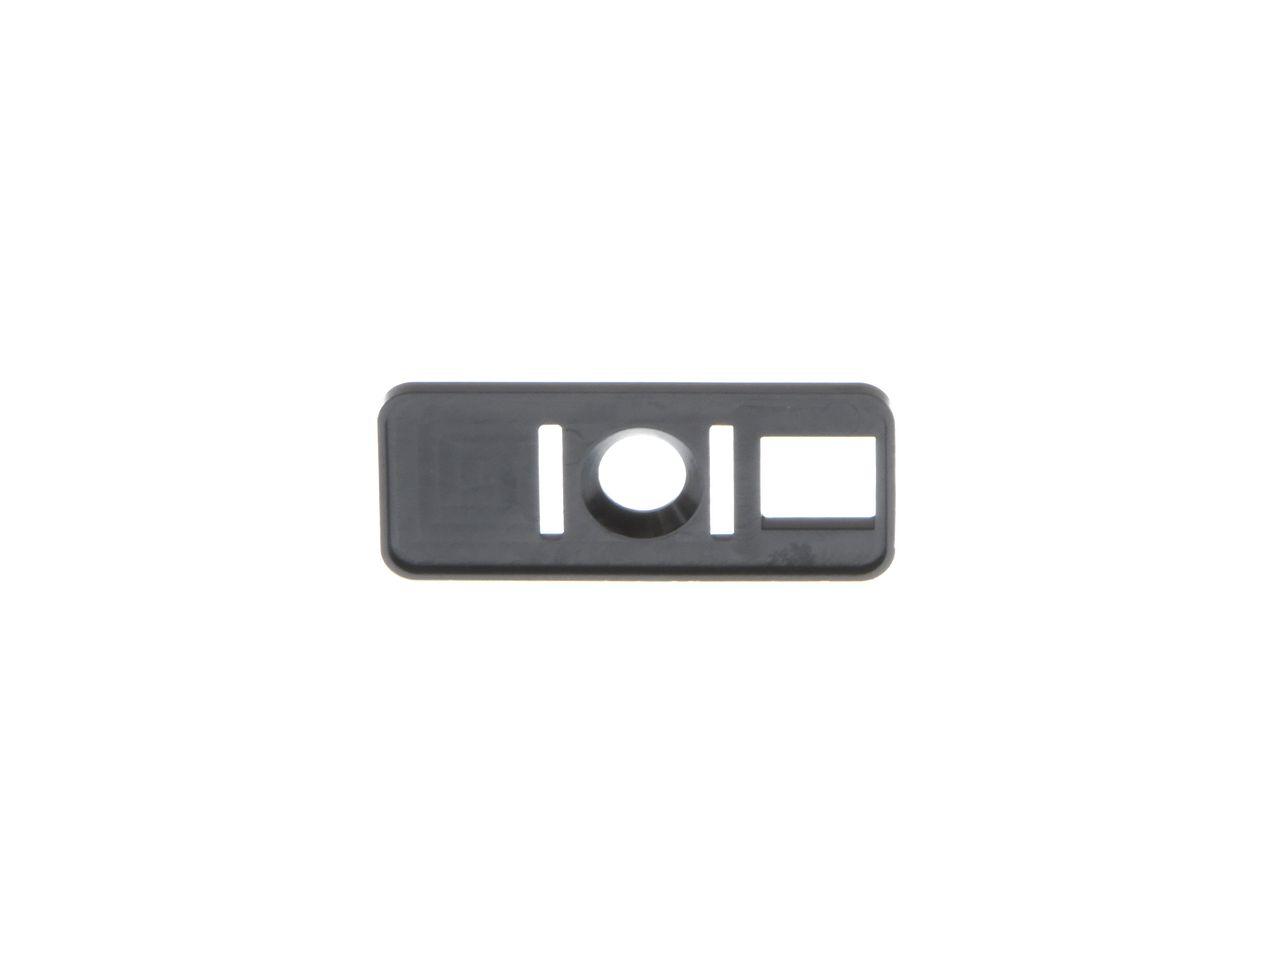 VFC M4/HK416GBBRマガジン(V-MAG)バルブベースパッキン(VG20MAG140)